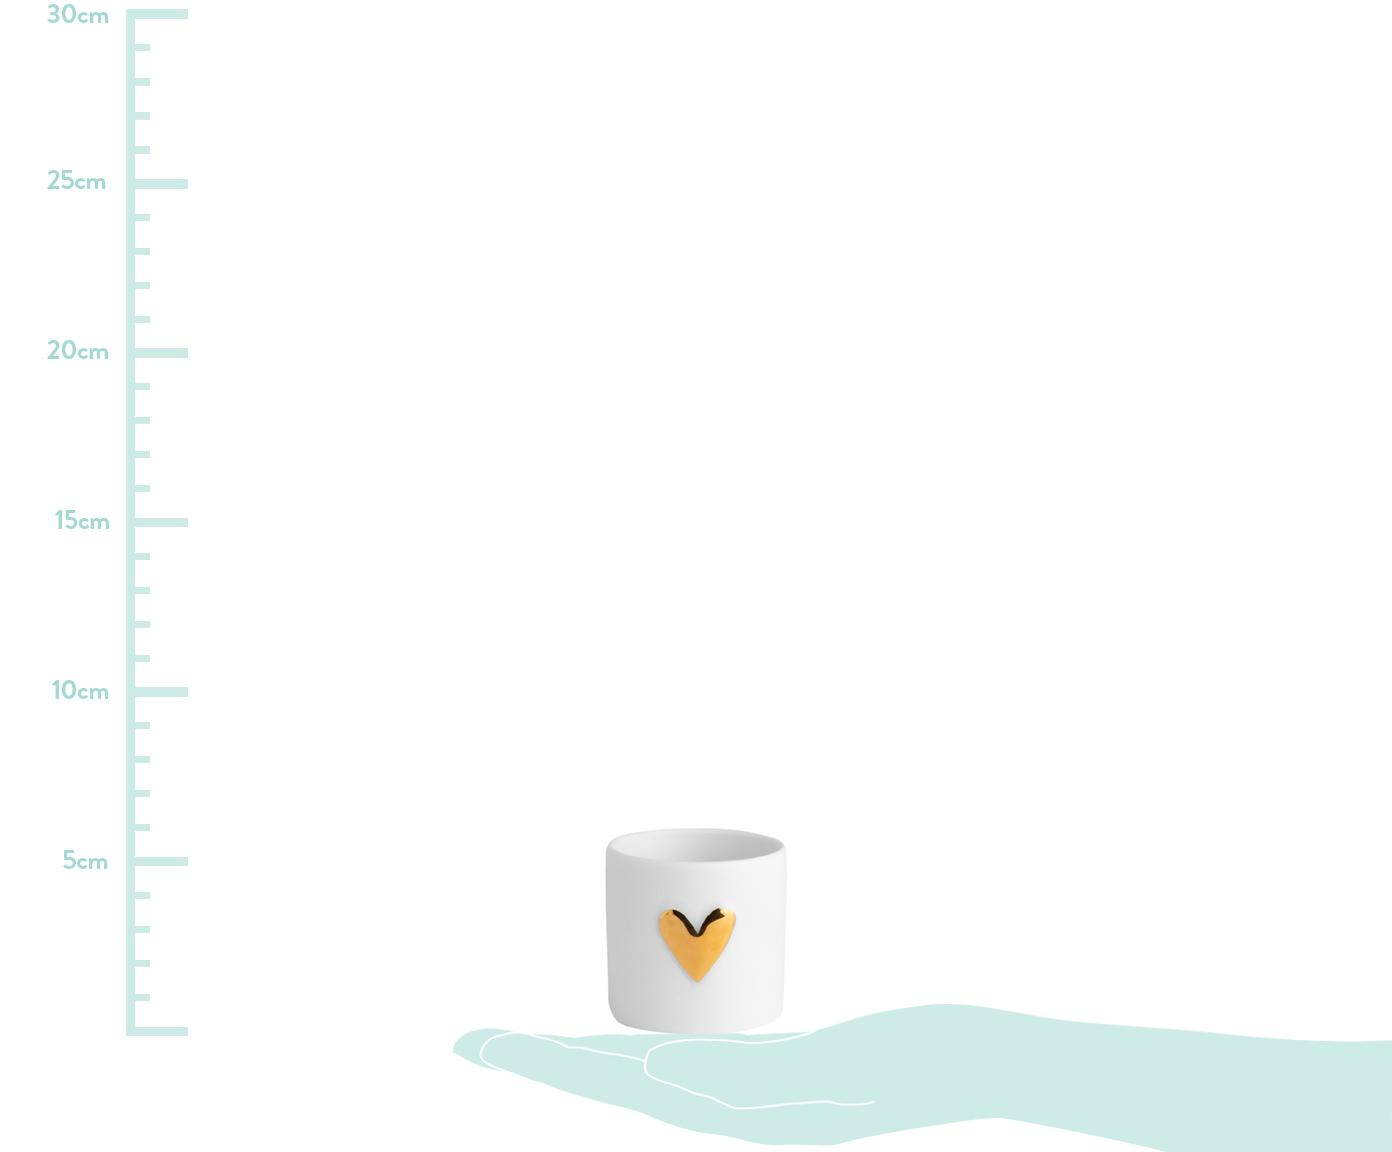 Teelichthalter Heart, Porzellan, 2 Stück, Porzellan, Weiß, Goldfarben, Ø 5 x H 5 cm